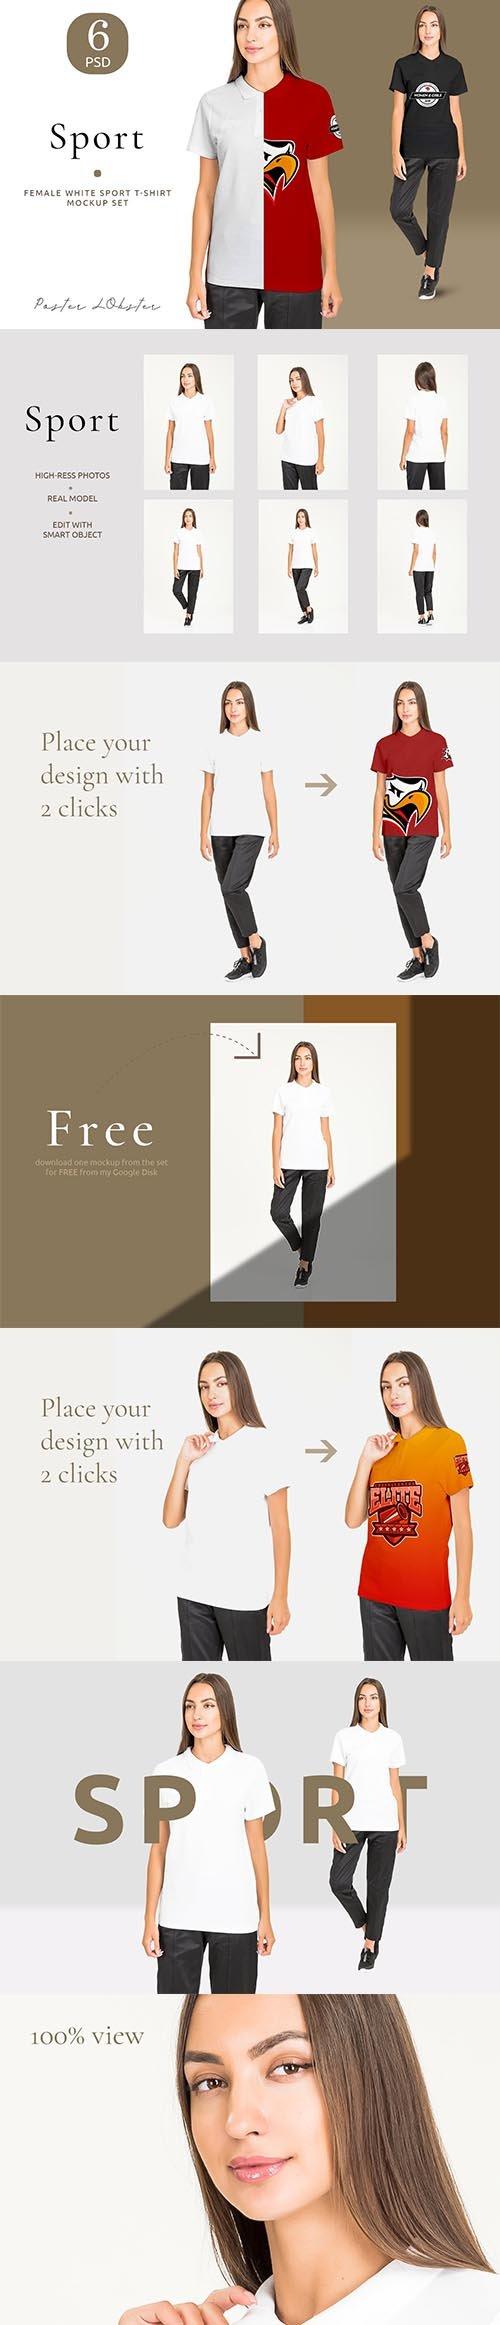 CreativeMarket - Women sport t-shirt mockup set 4158156